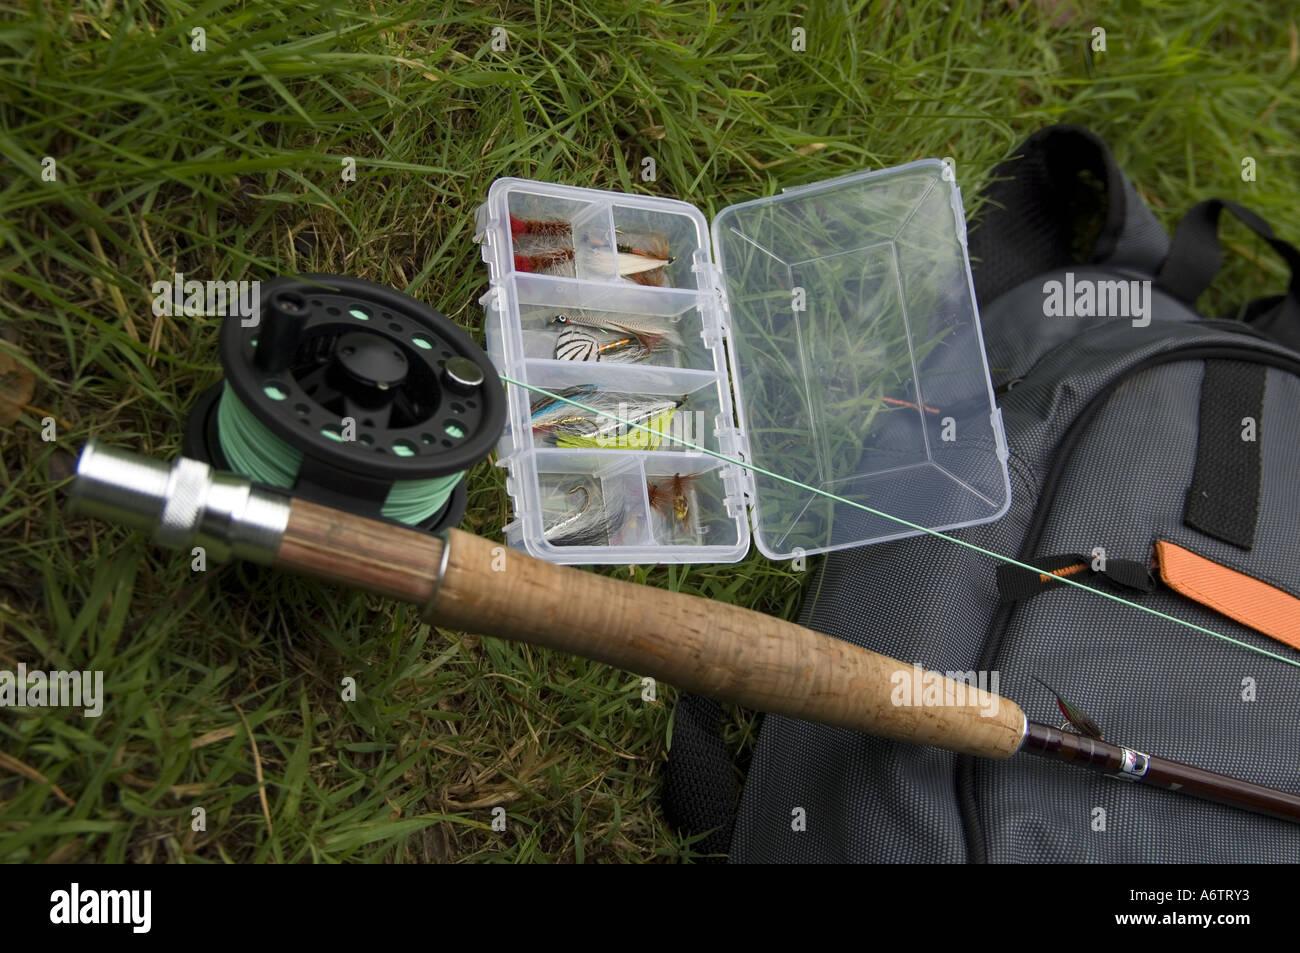 5893844c6 Fly Fishing Rod Reel Bag Stock Photos & Fly Fishing Rod Reel Bag ...